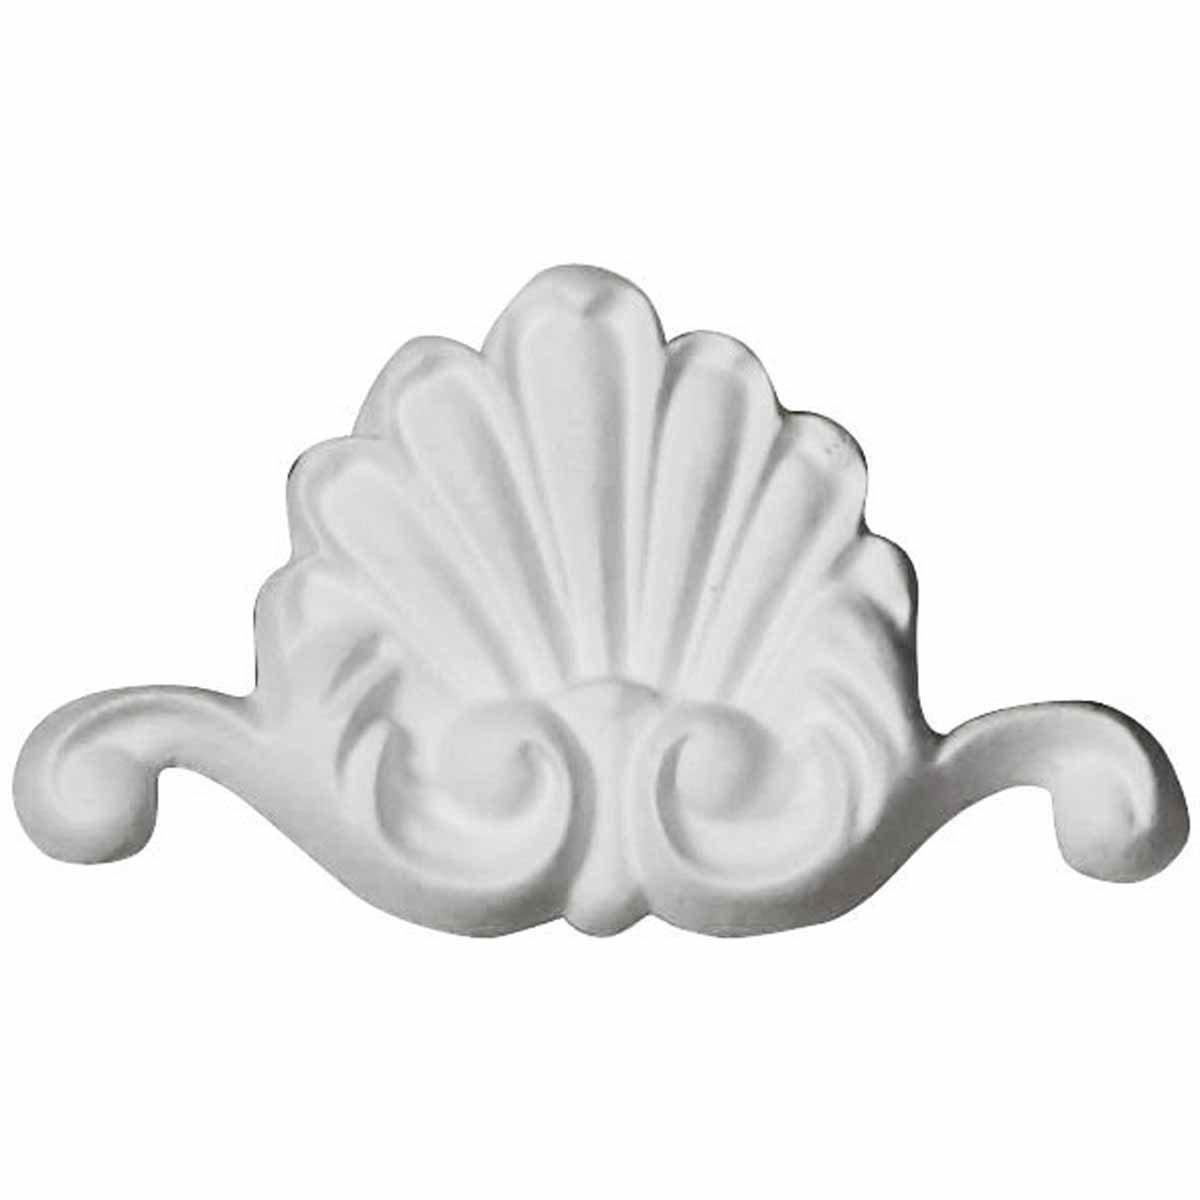 Ekena Millwork ONL03X02X00BO 3''W x 1 3/4''H x 3/8''P Bordeaux Shell Onlay White by Ekena Millwork (Image #1)